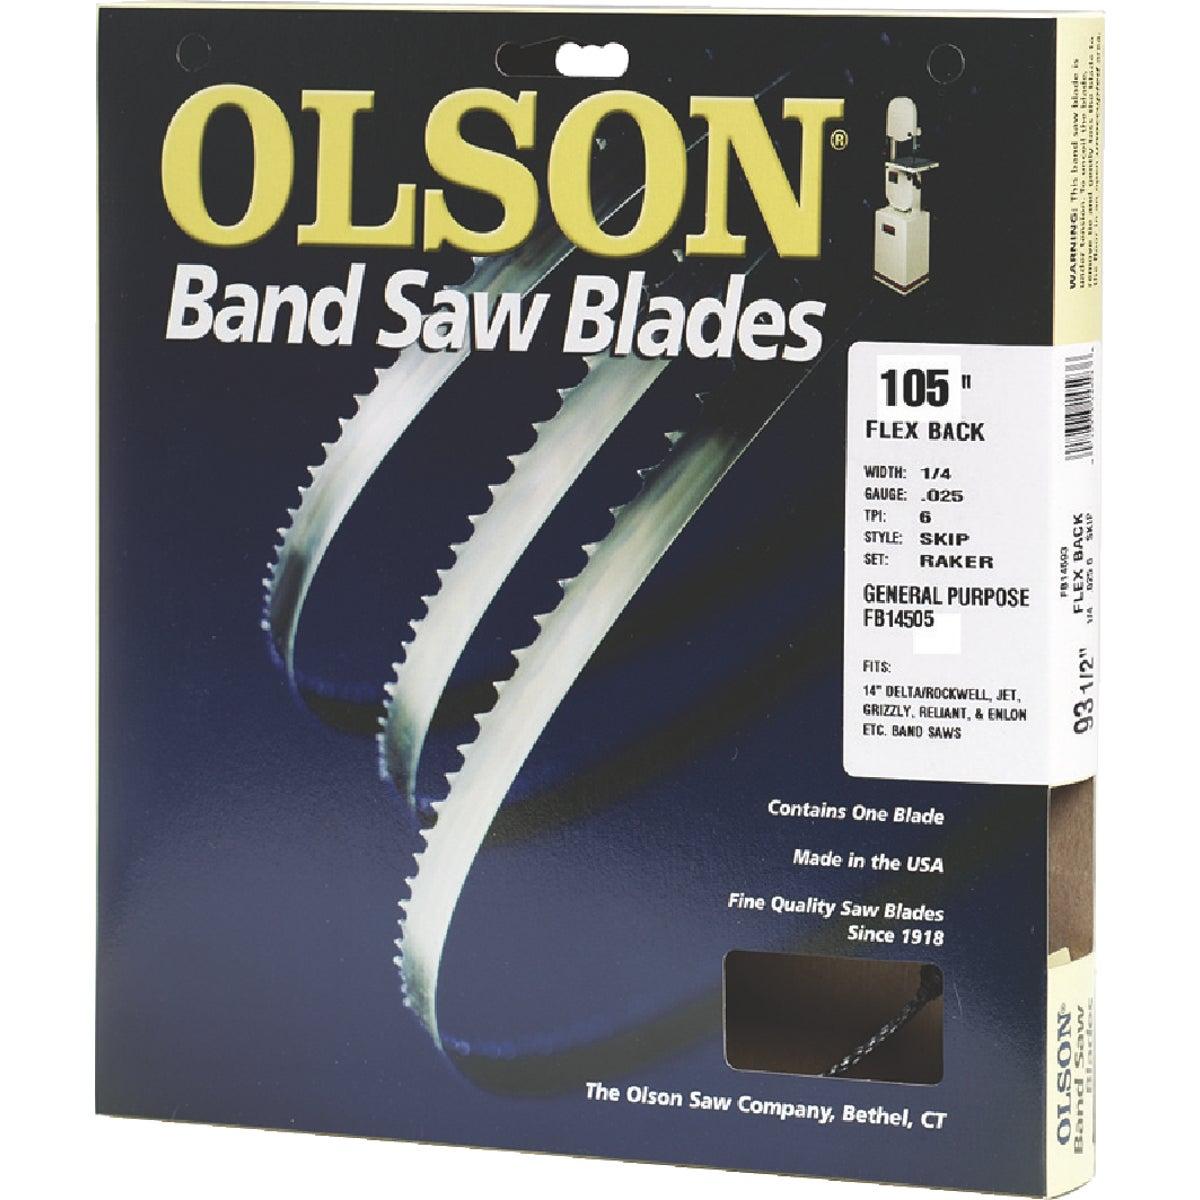 "105"" BANDSAW BLADE - 23105 by Olson Saw Co"